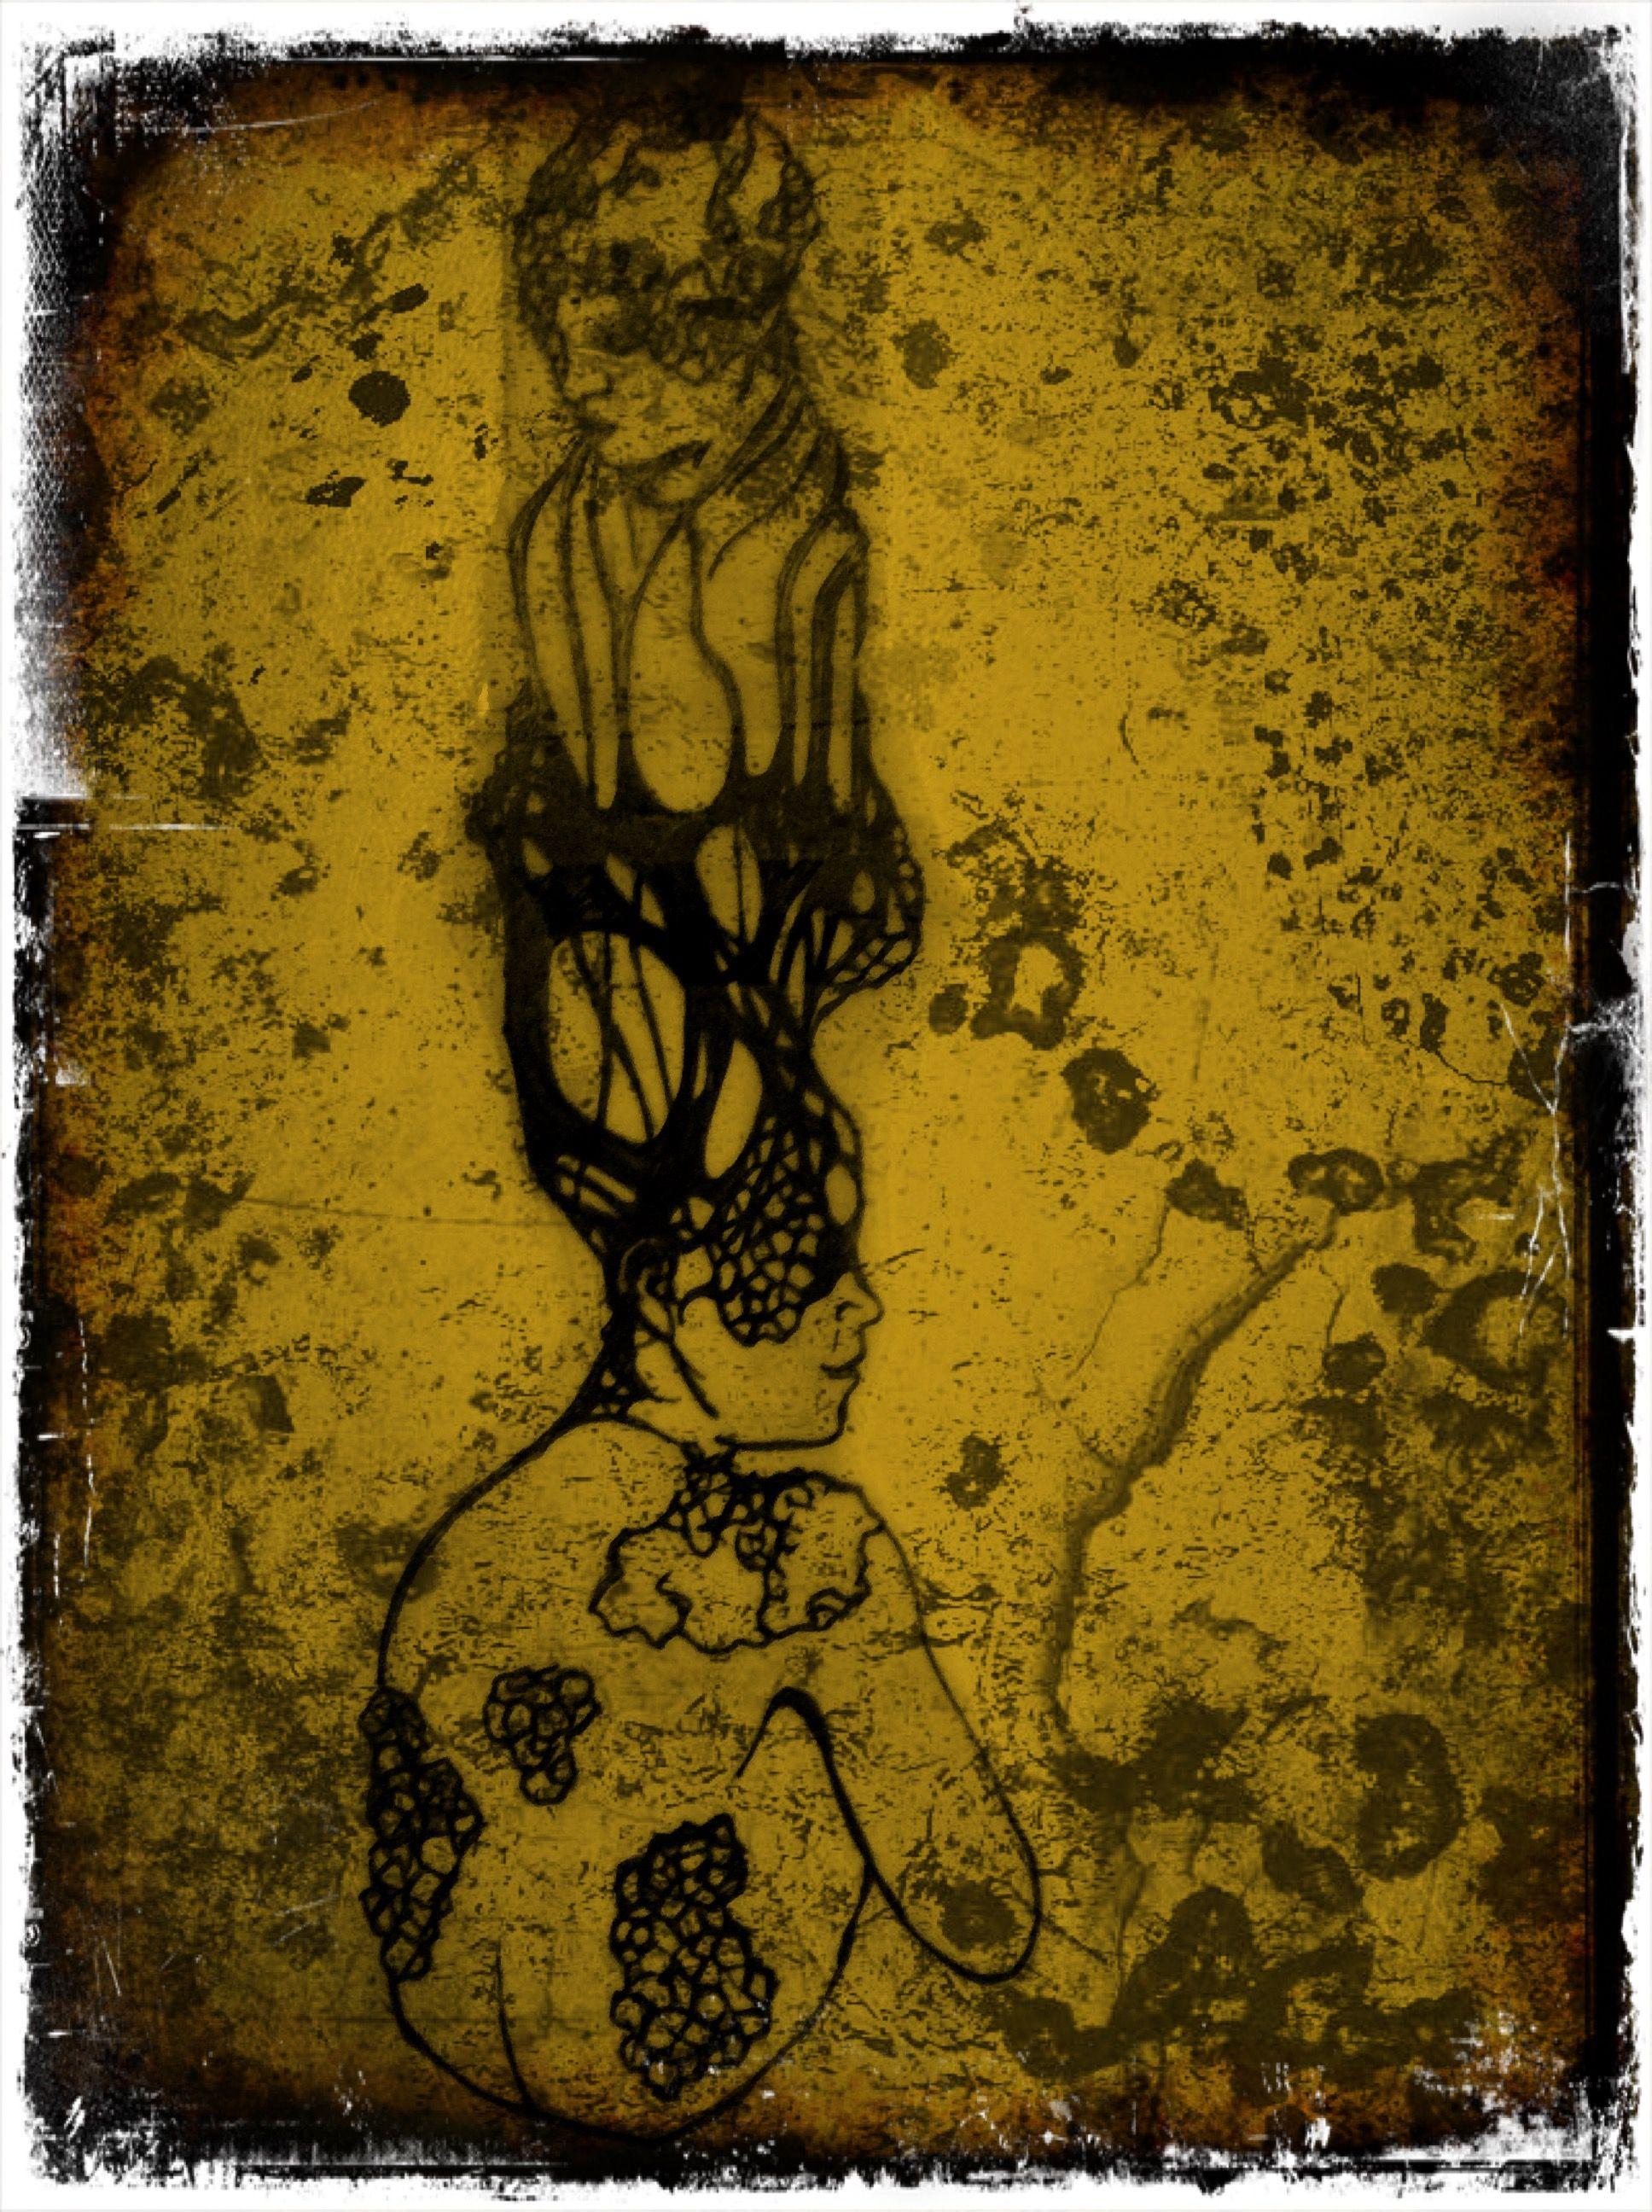 """extensions"" screenprint/desing by Drieghe Dimitri"